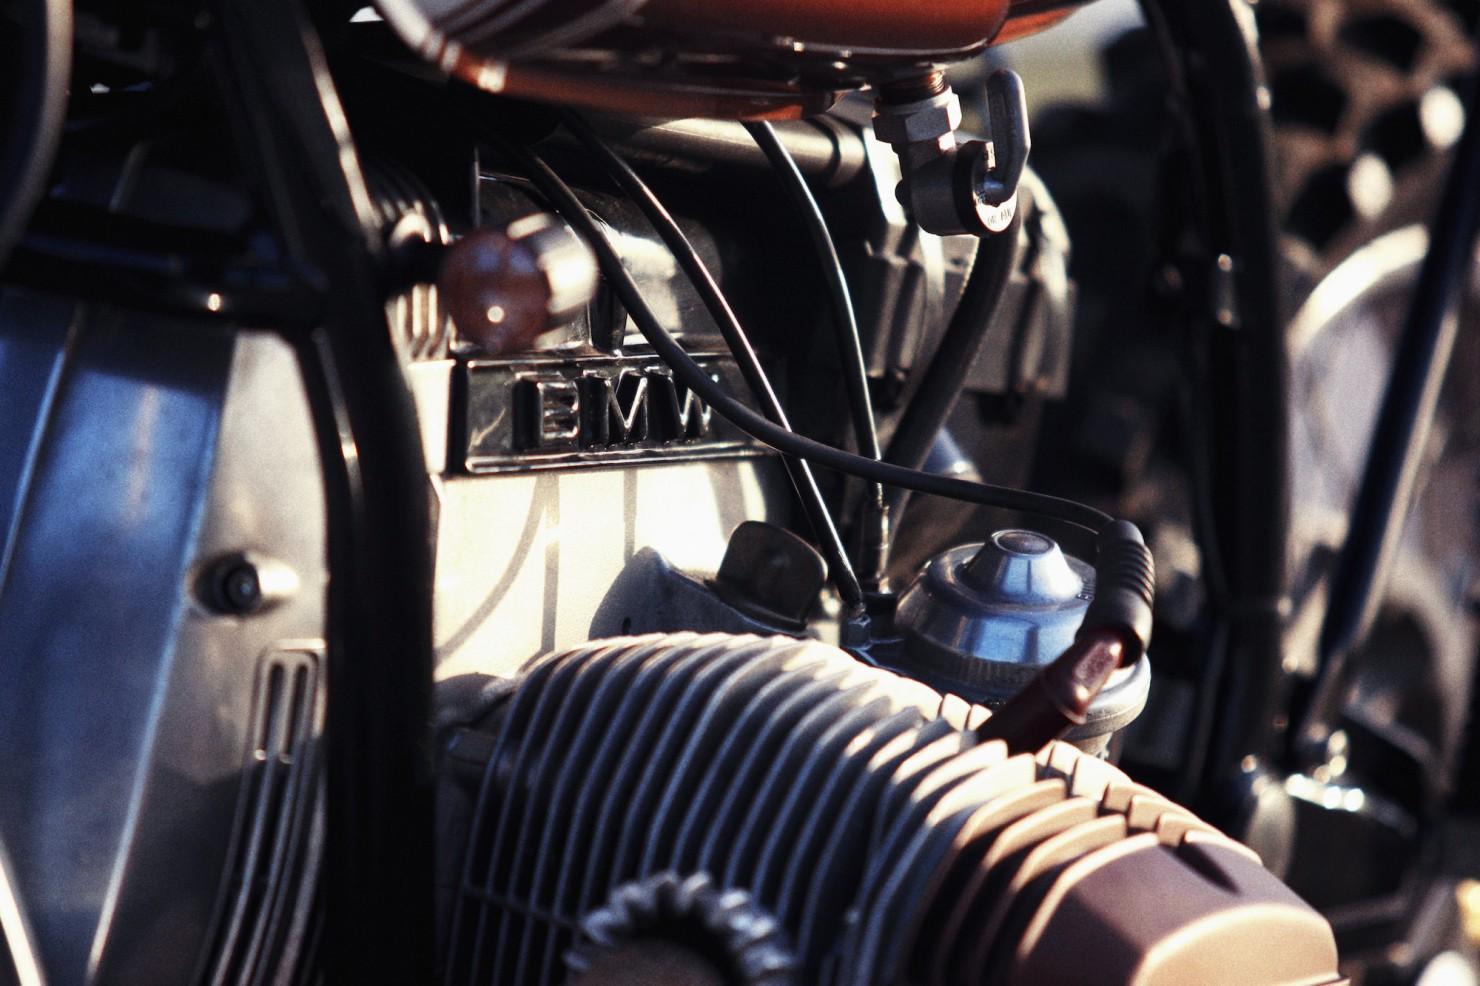 BMW R45 Custom Motorcycle 15